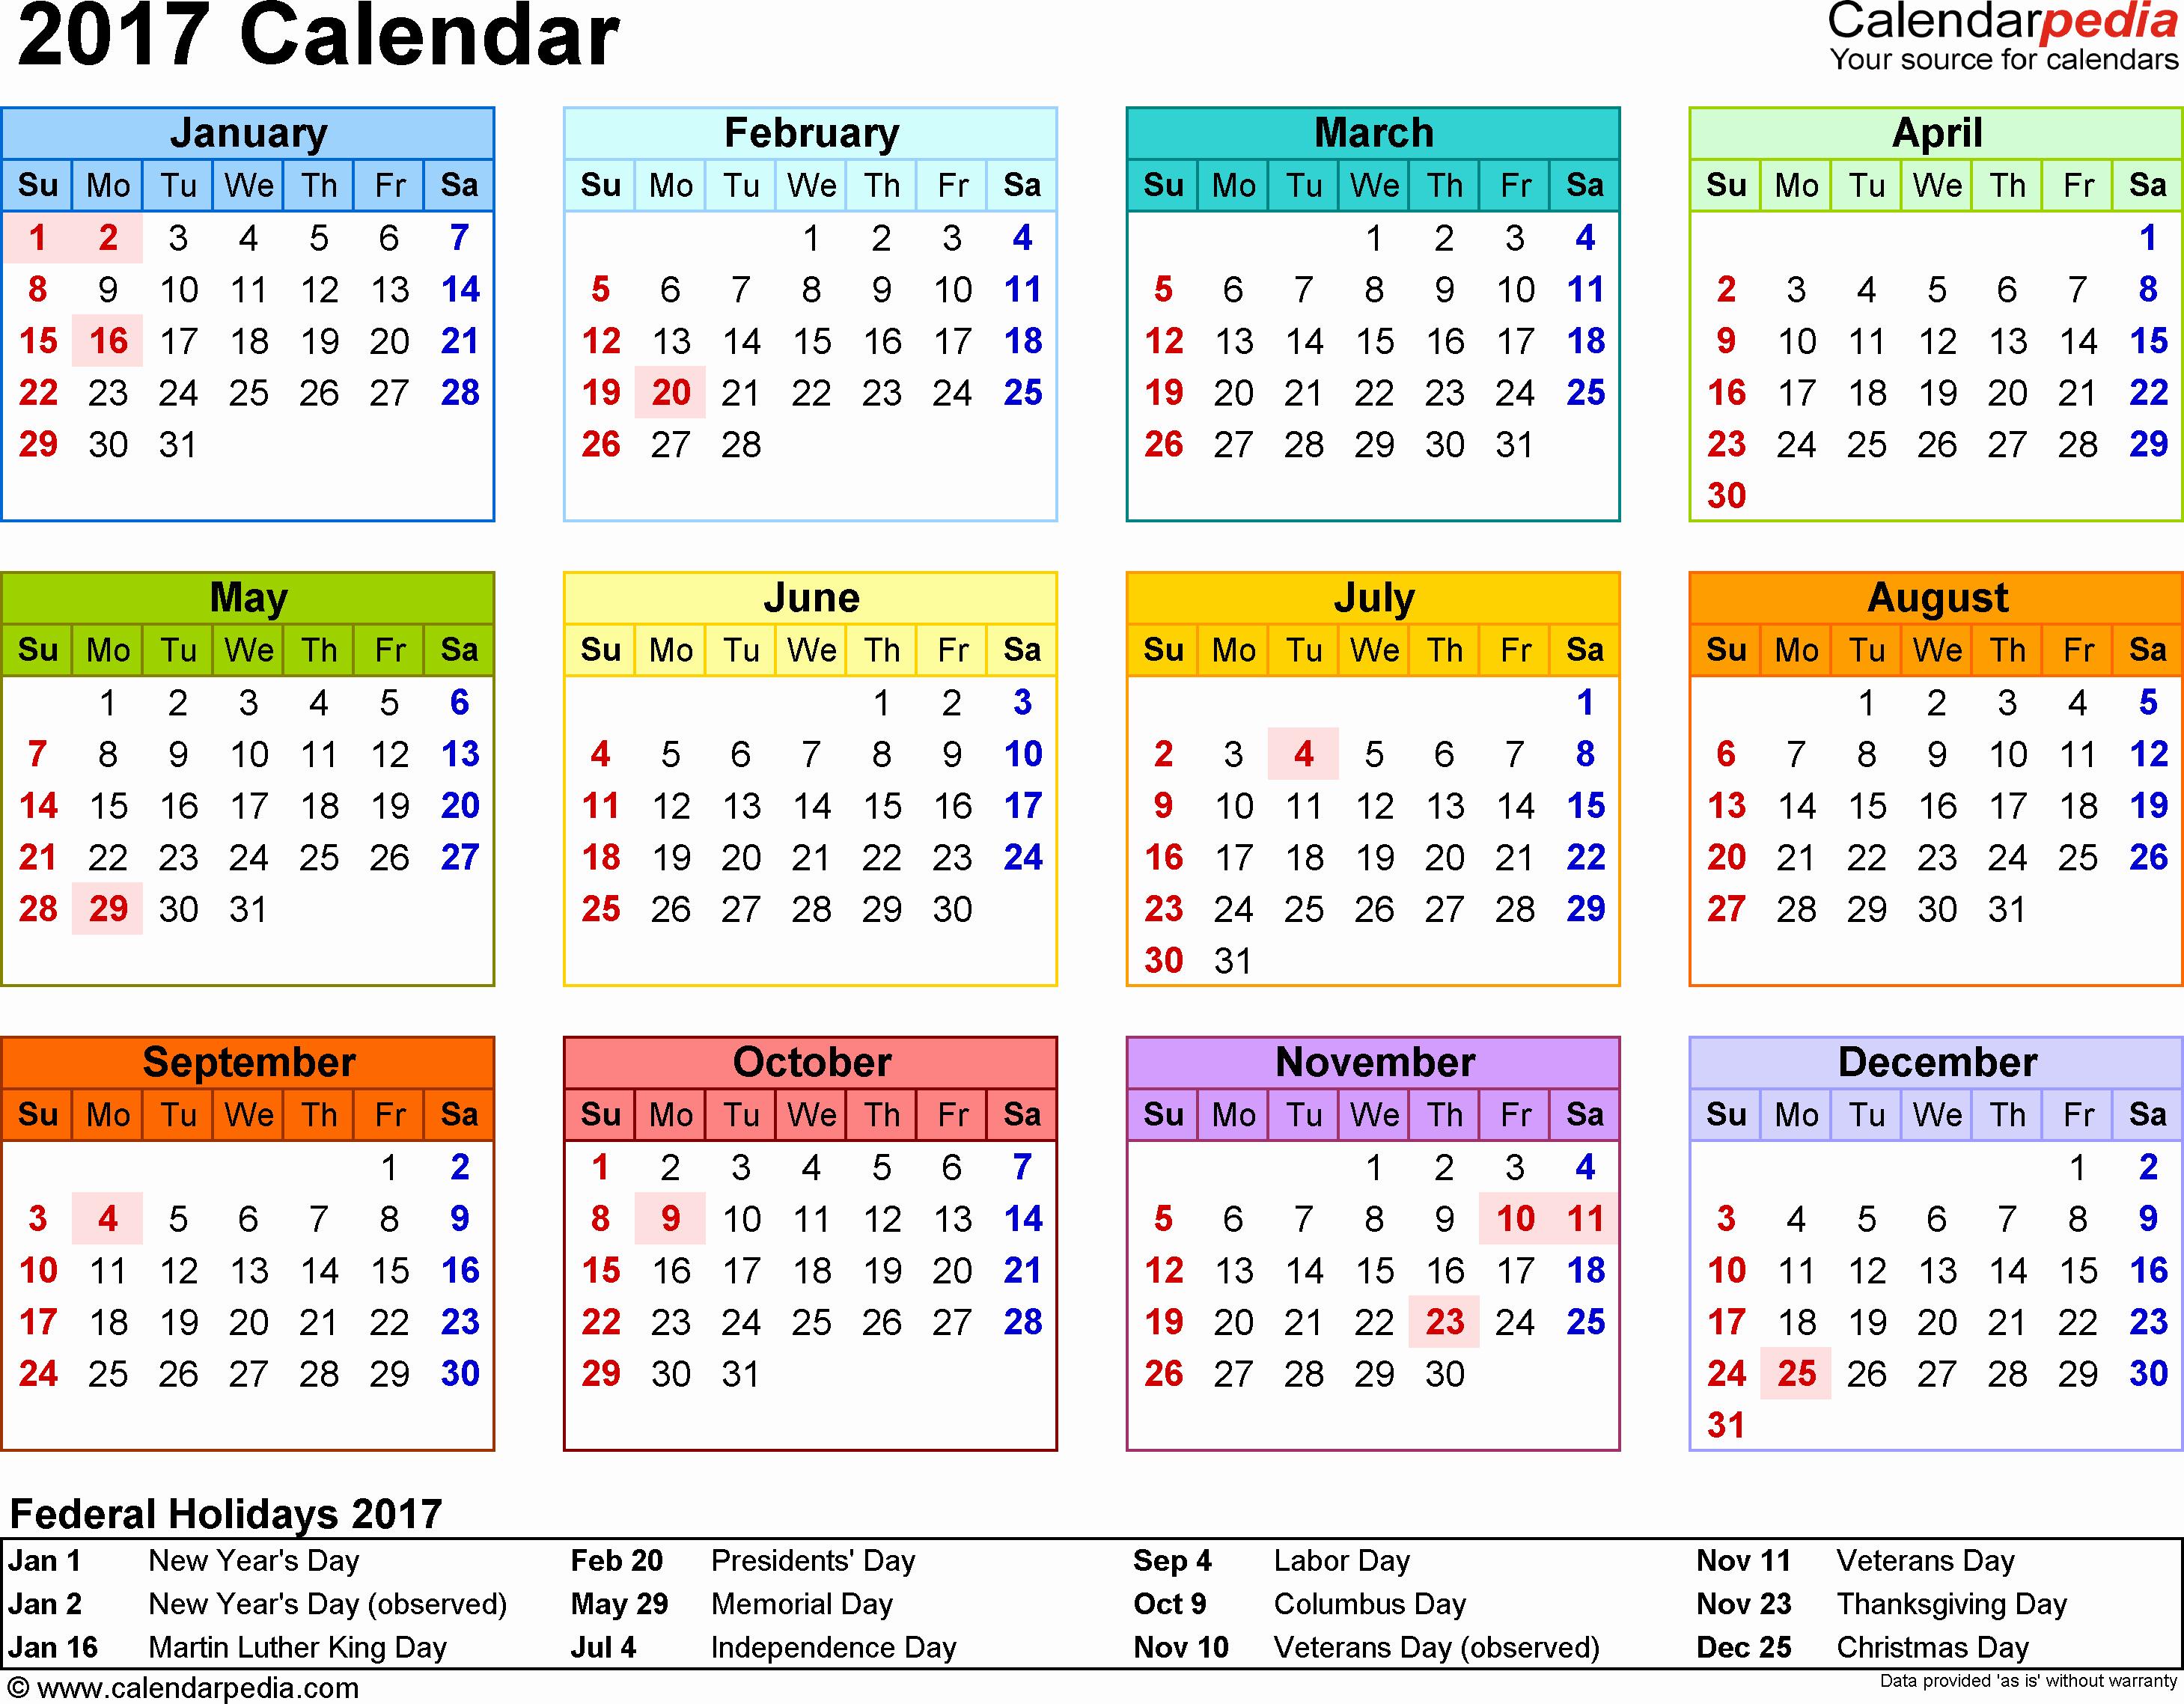 Calendar 2017 Template with Holidays Fresh May 2017 Calendar Excel